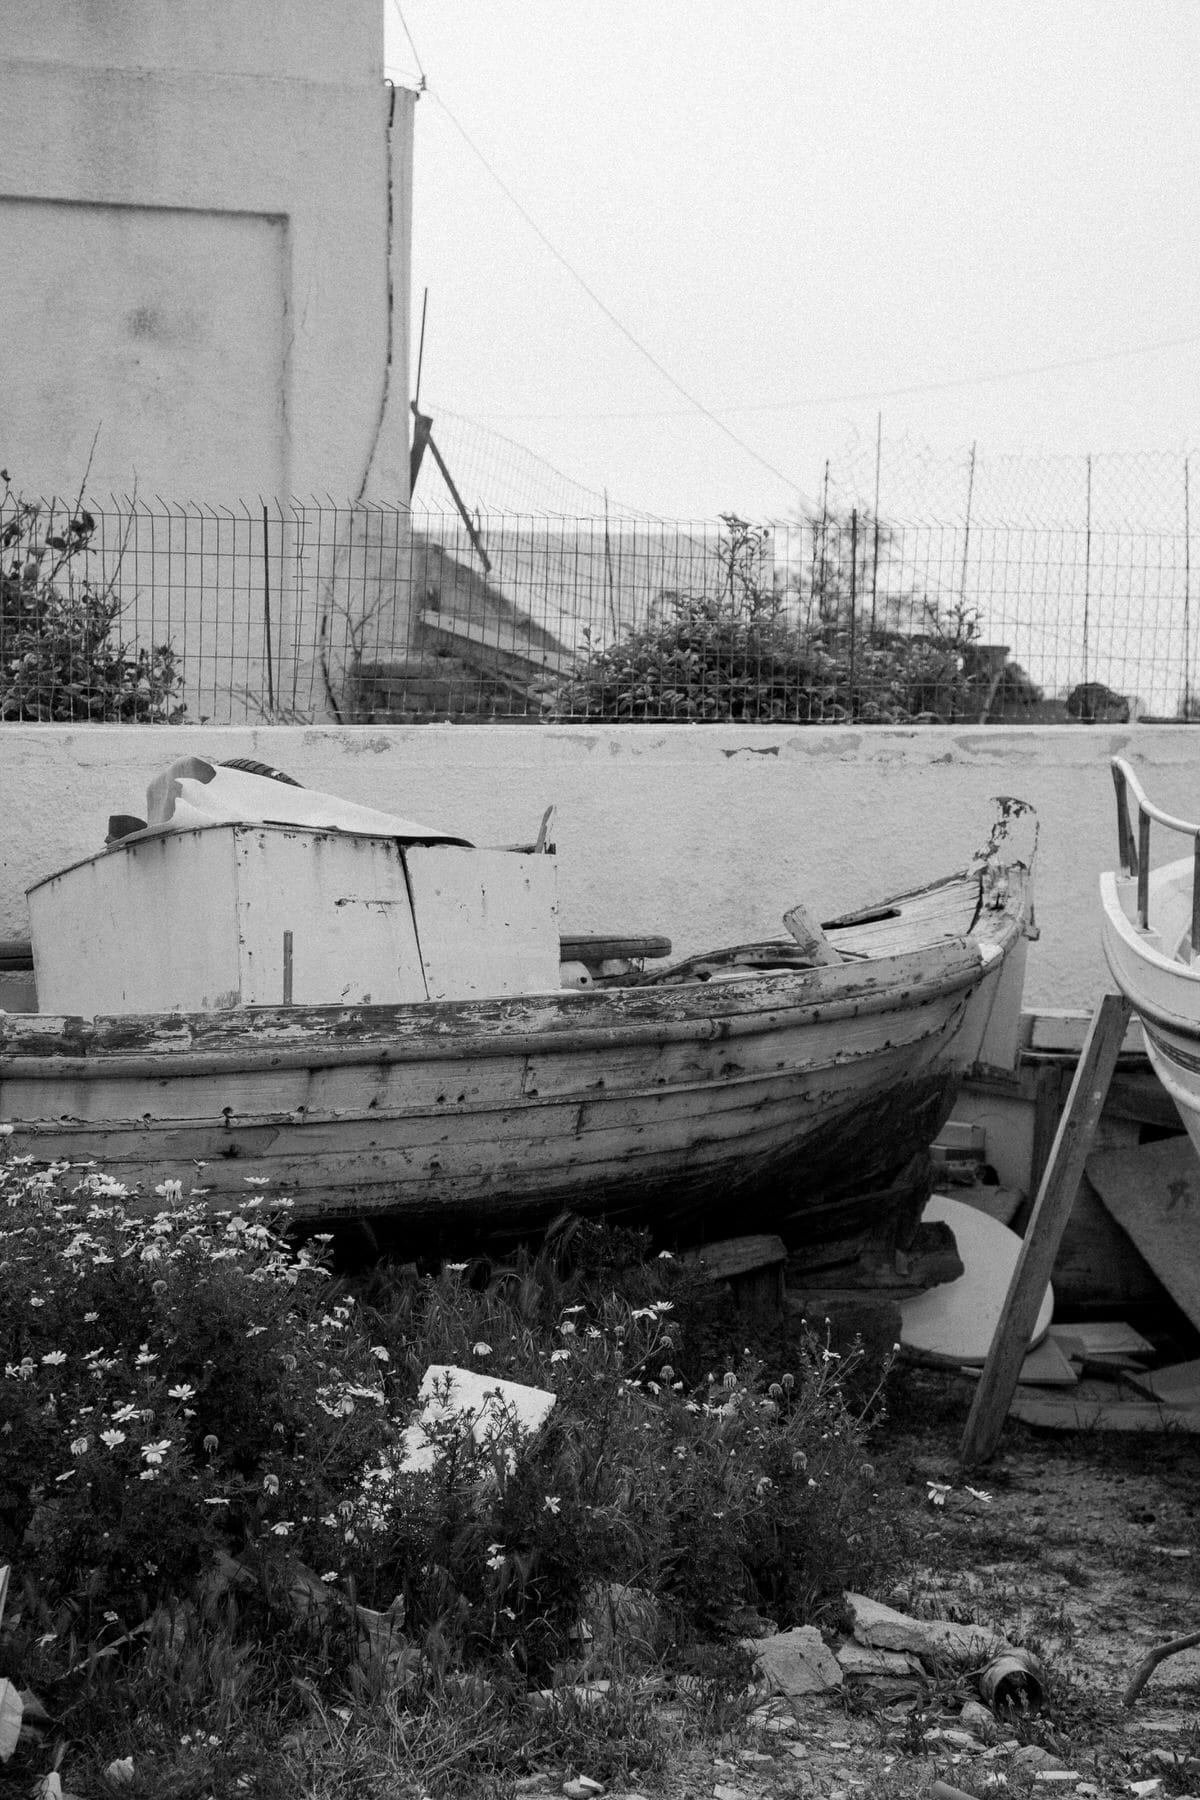 Santorini-Greece-black-and-white-fine-art-photography-by-Studio-L-photographer-Laura-Schneider-_2983